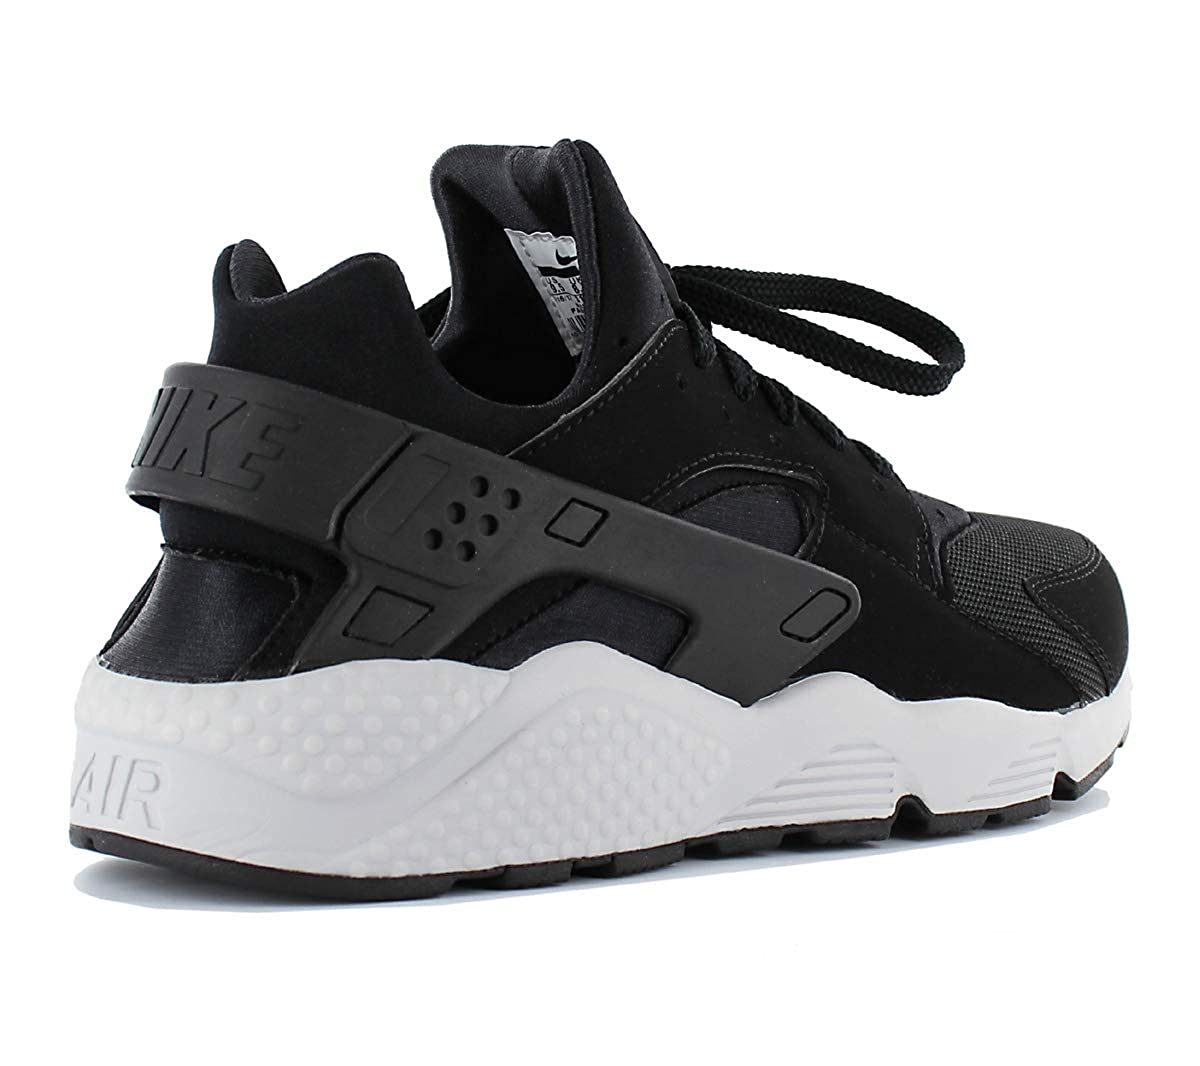 best website cf92a e0233 Nike Air Huarache, Baskets Basses Homme  Amazon.fr  Chaussures et Sacs